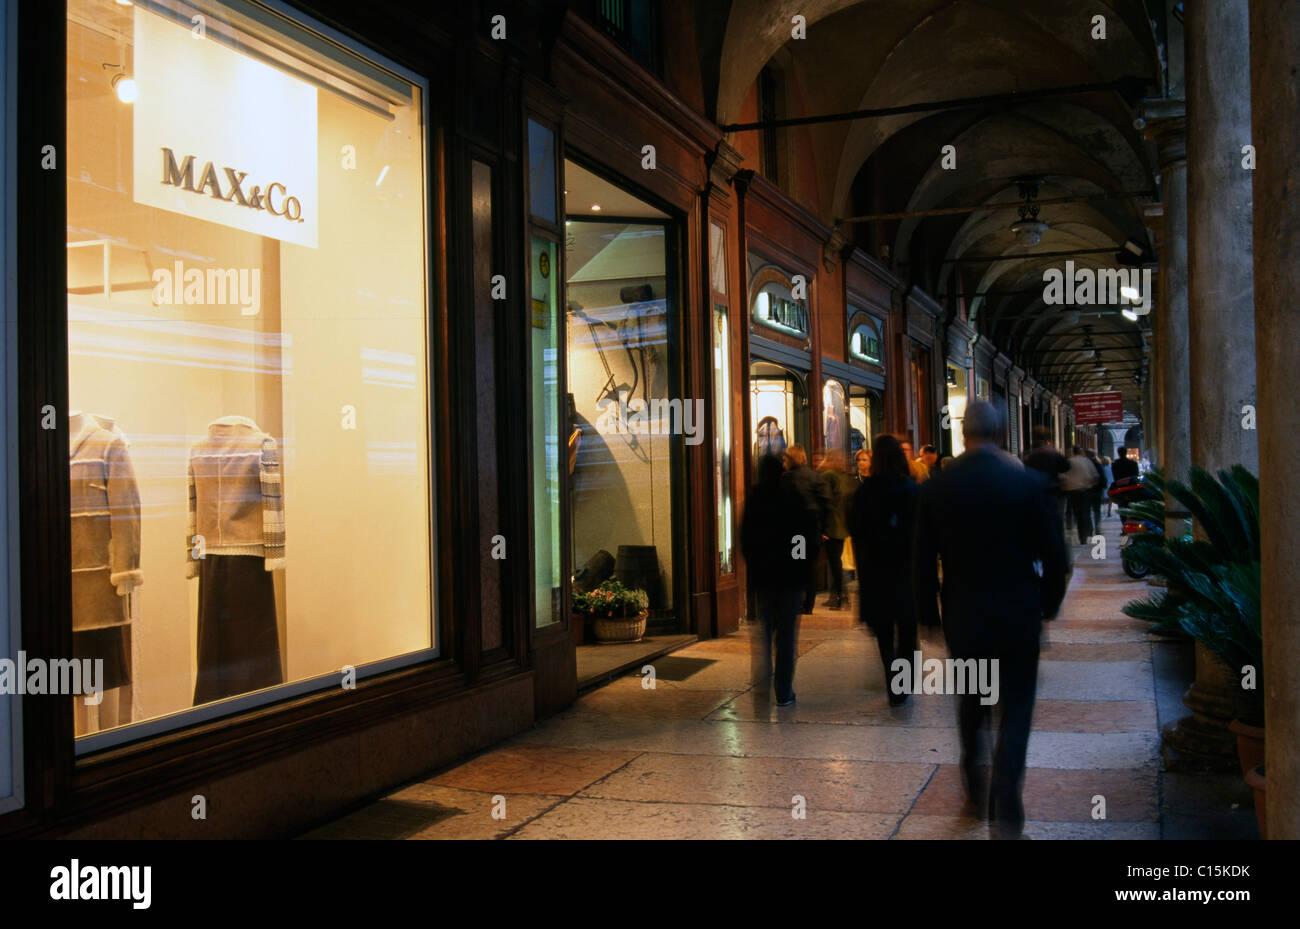 Boutiques, shopping, Bologna, Emilia-Romagna, Italy - Stock Image